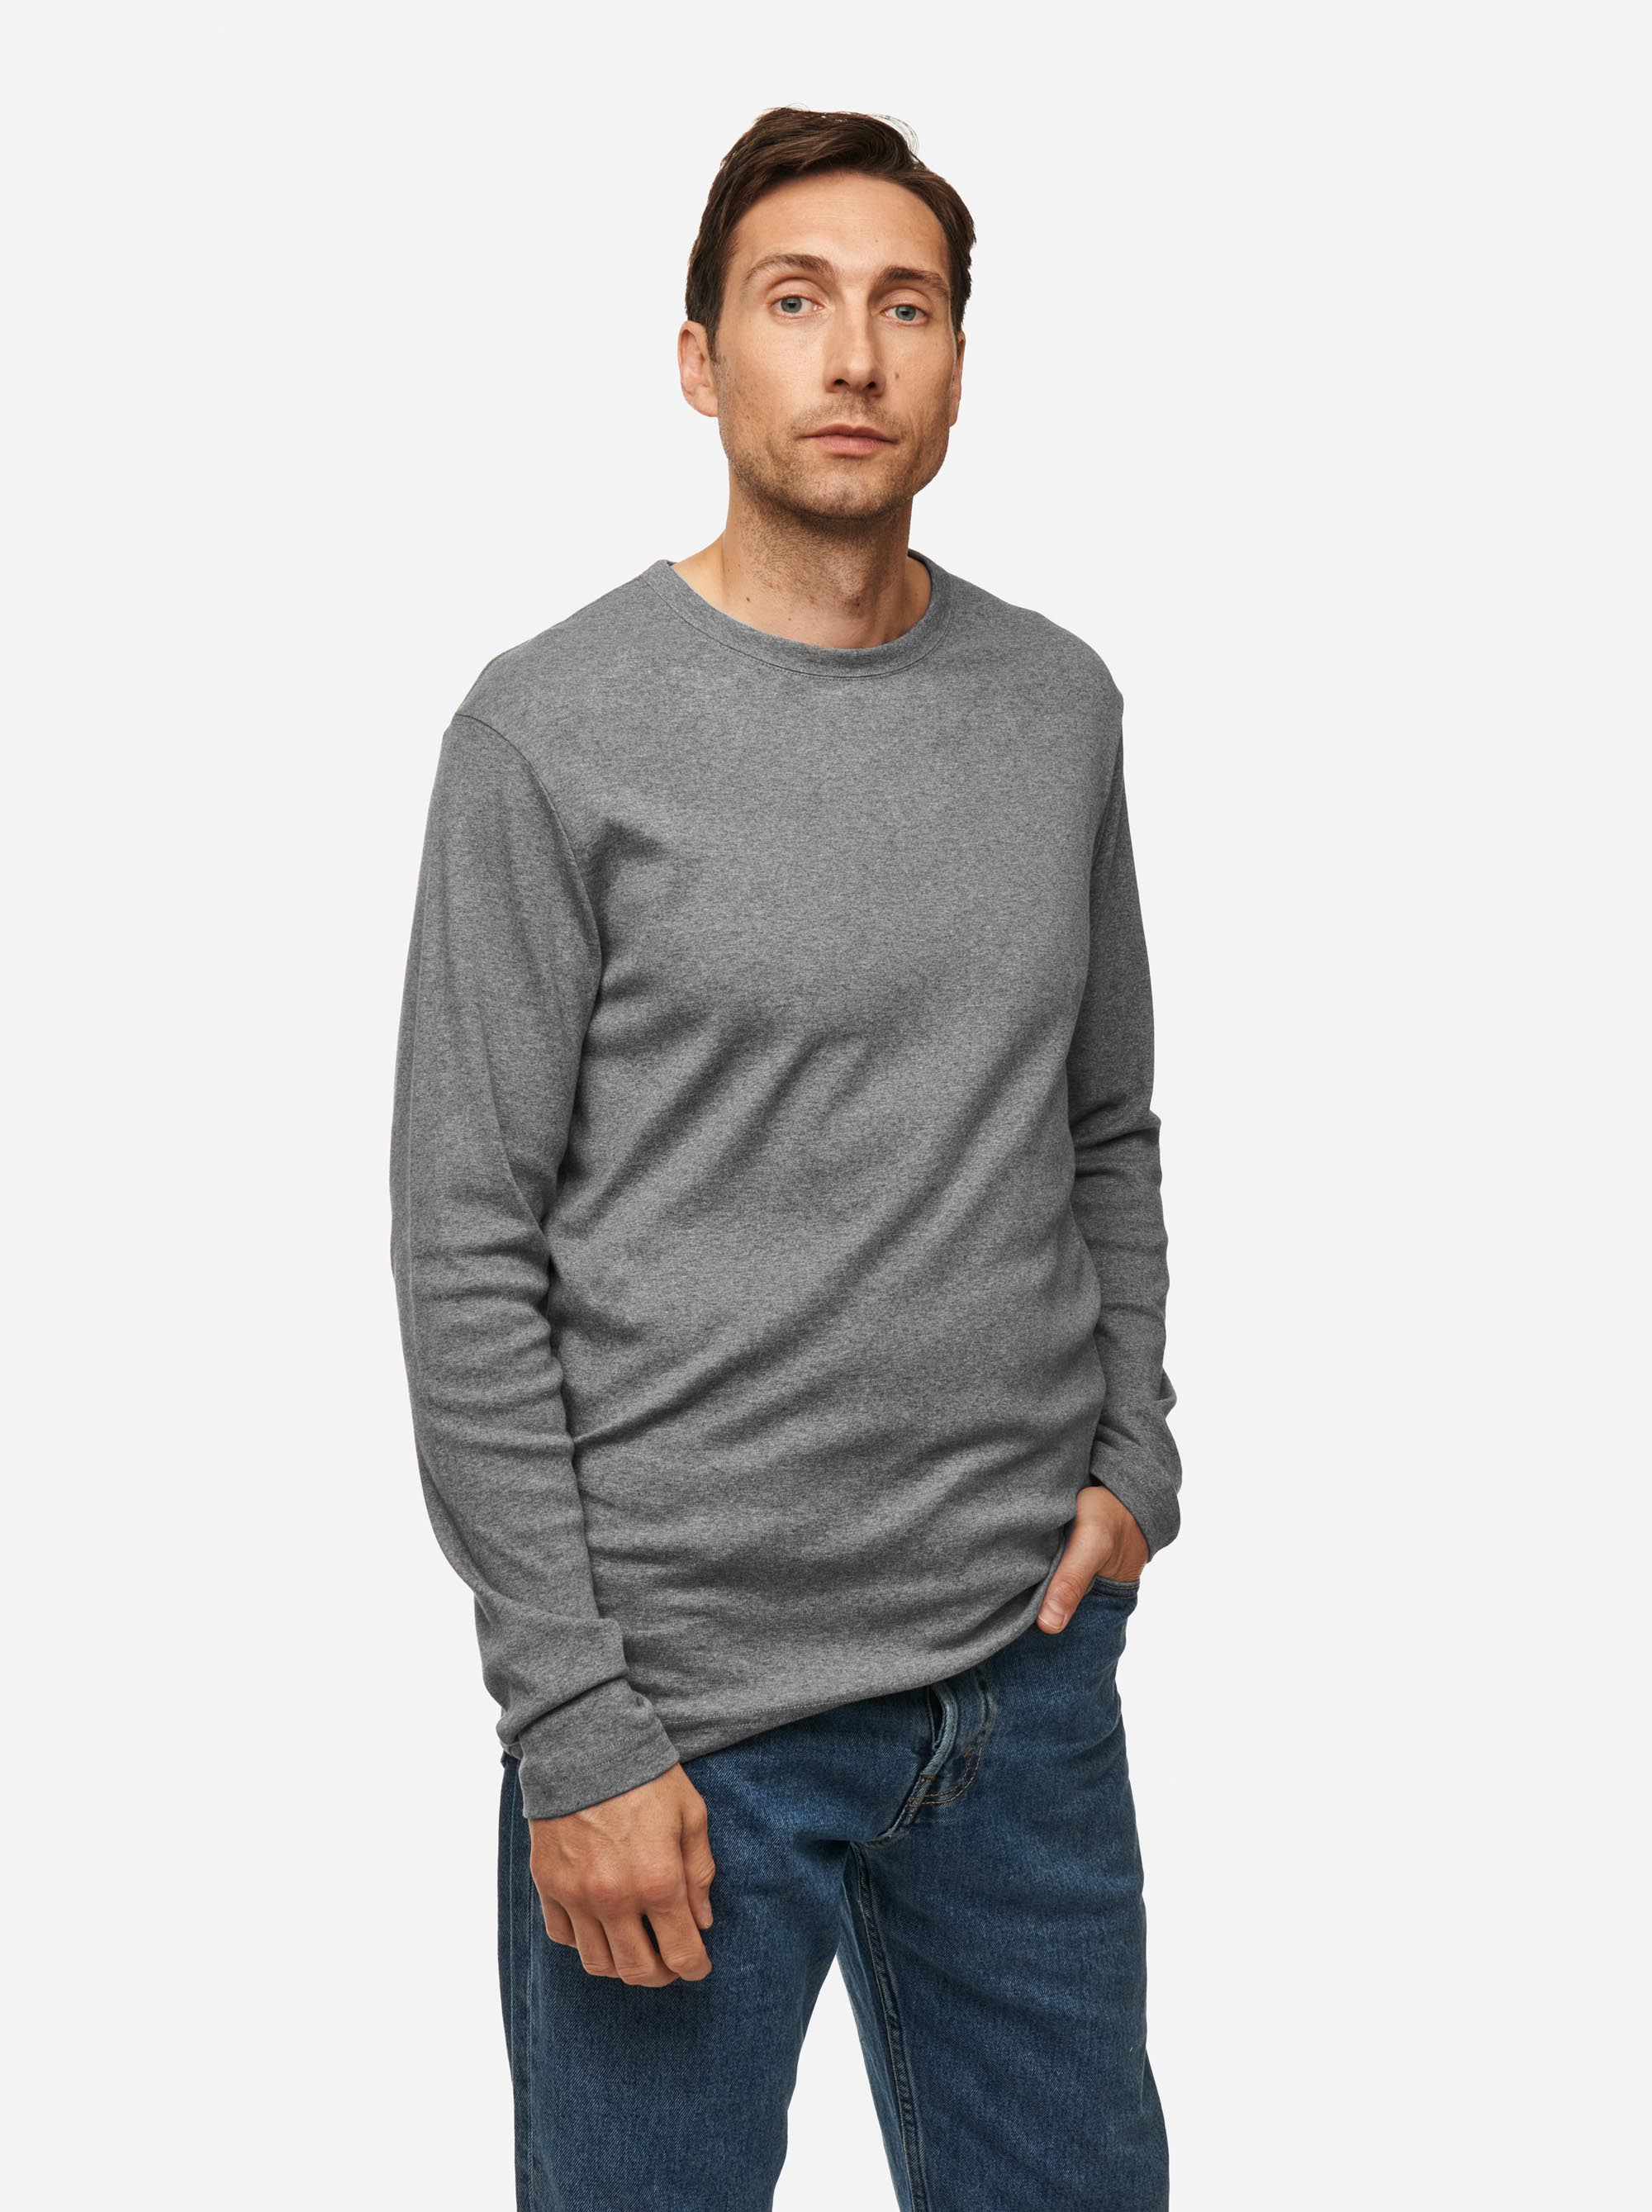 Teym - The-T-Shirt - Longsleeve - Men - Melange Grey - 3B